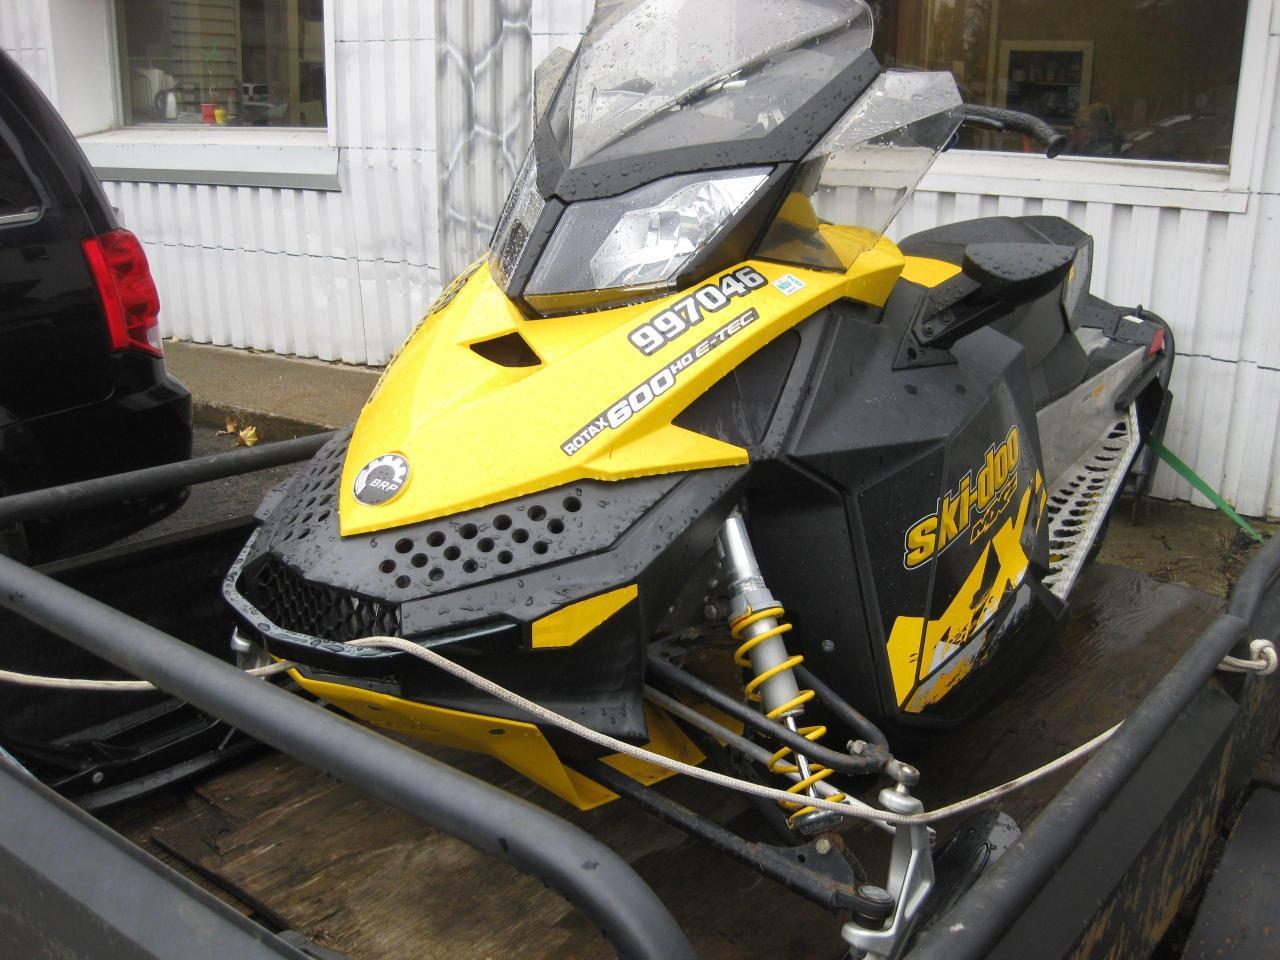 2010 Ski-Doo MX-Z 600 E-tech studded track (trailer NOT included)